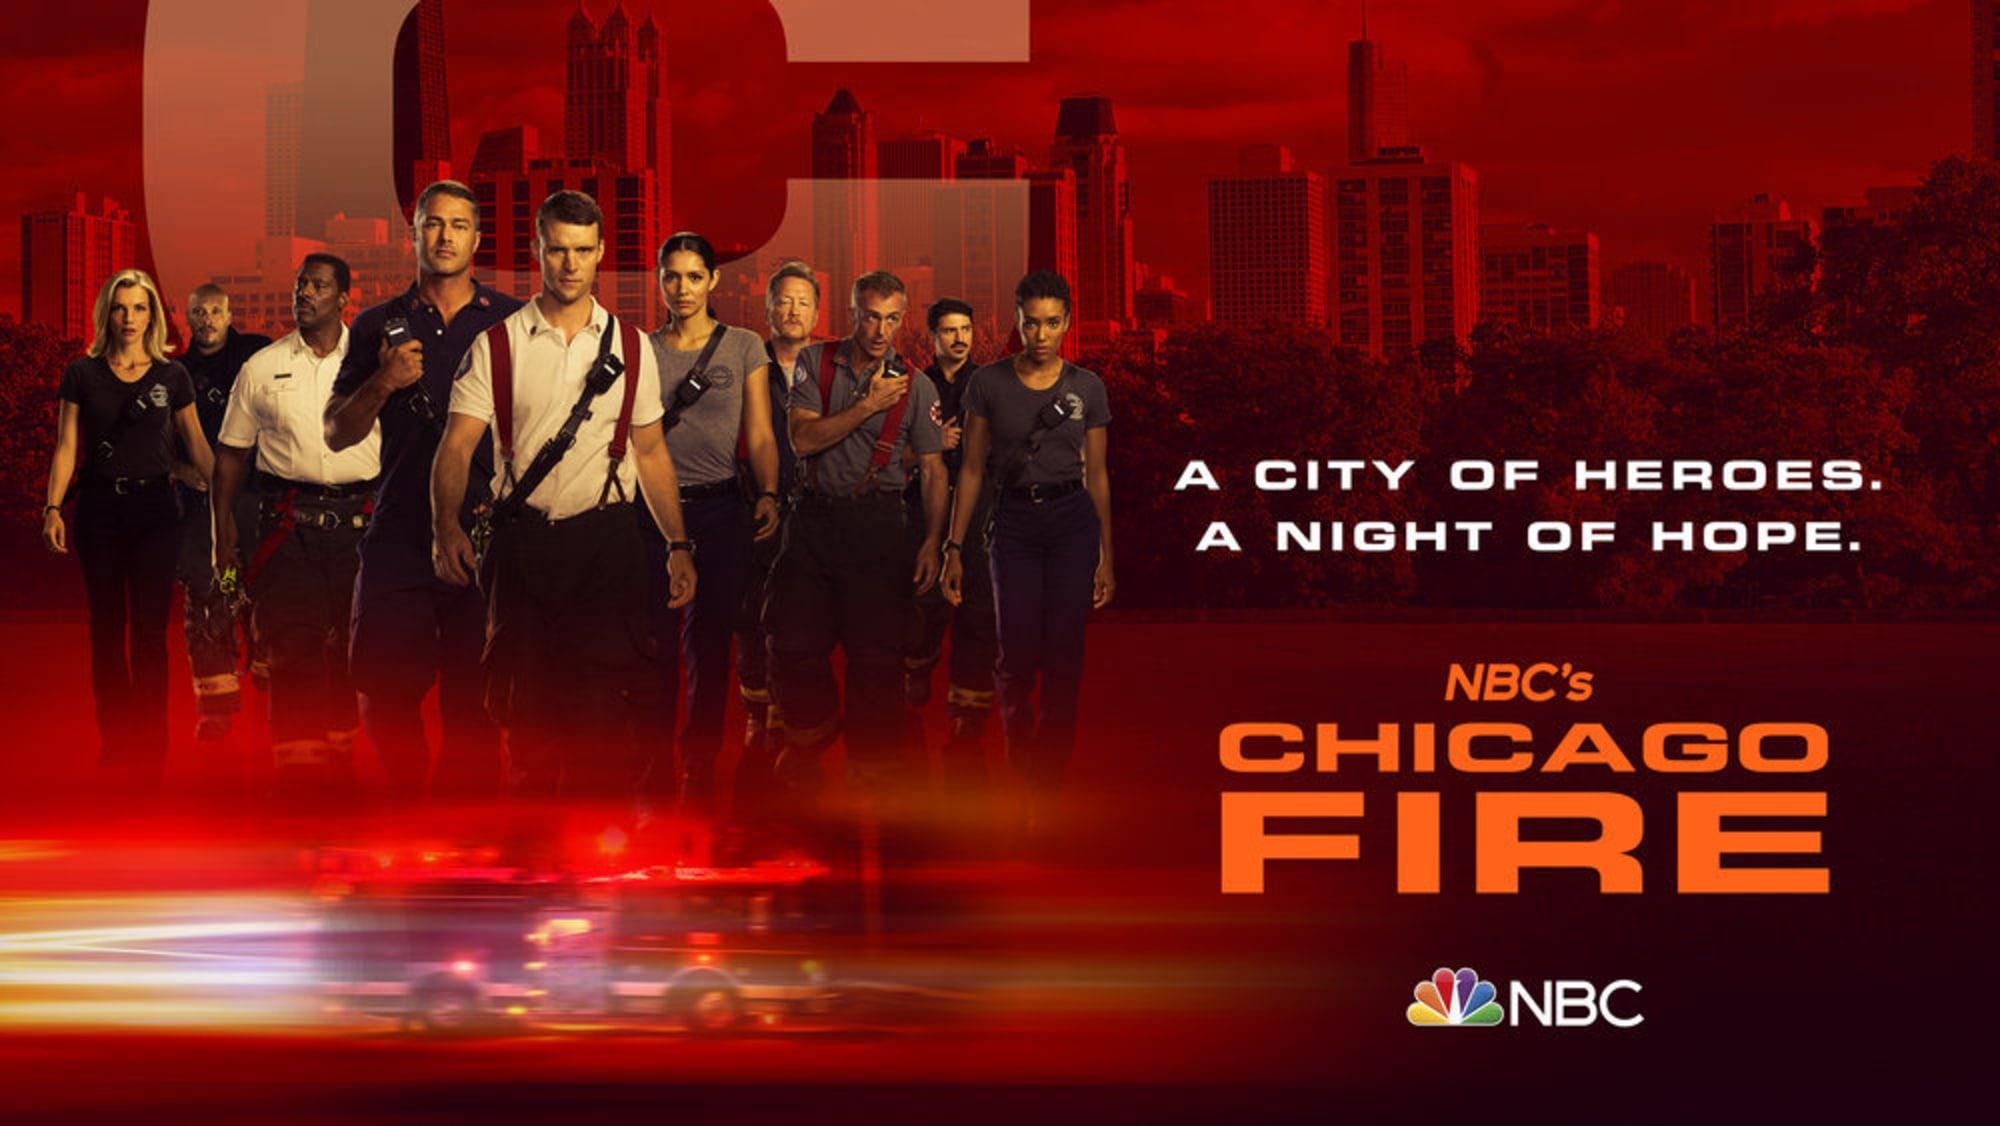 Is Chicago Fire season 8 new tonight, November 27, 2019?